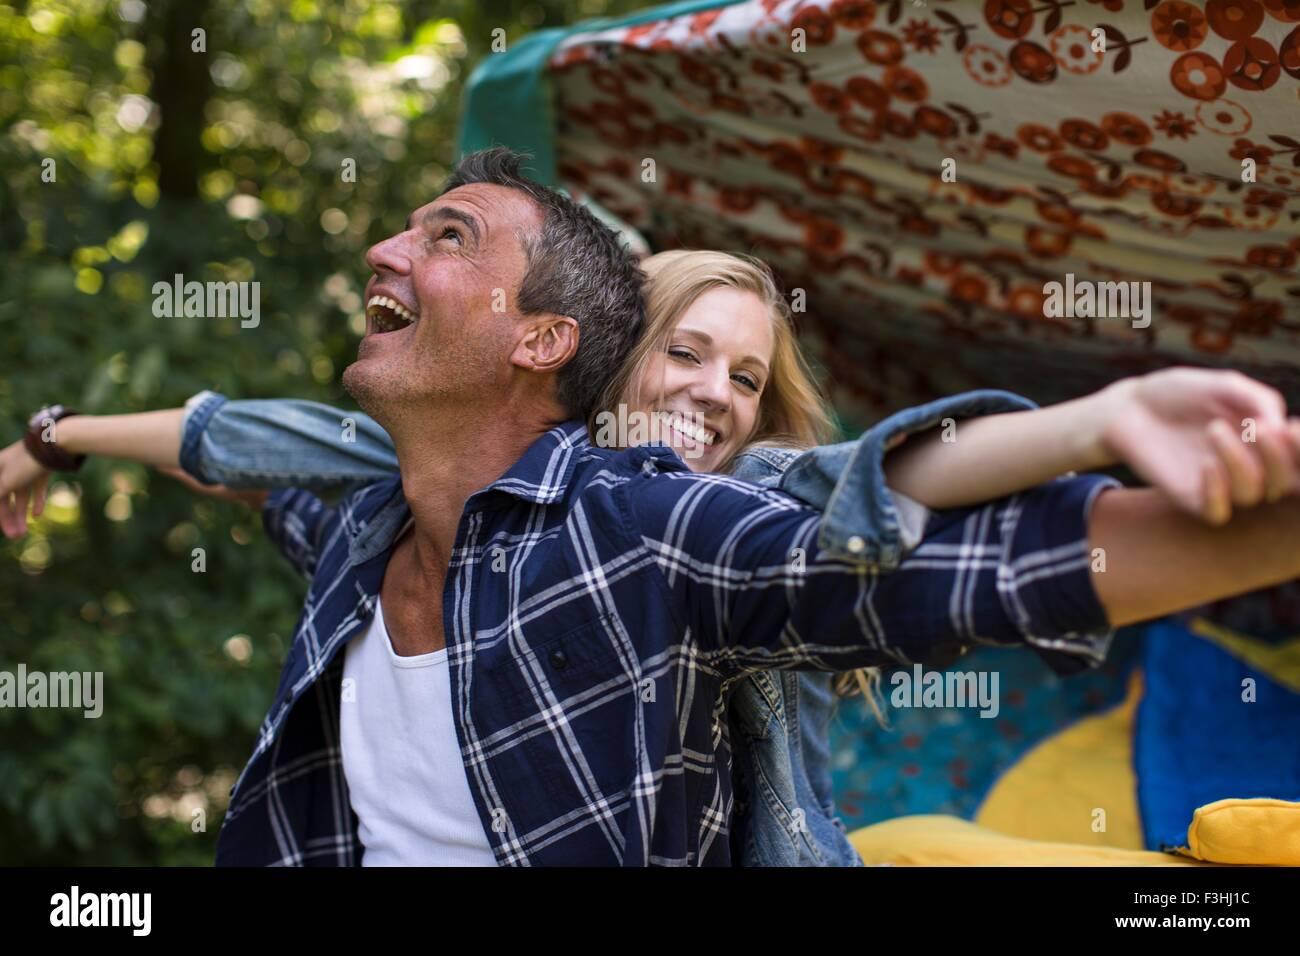 Reifer Mann und Freundin herumalbern während camping Stockbild